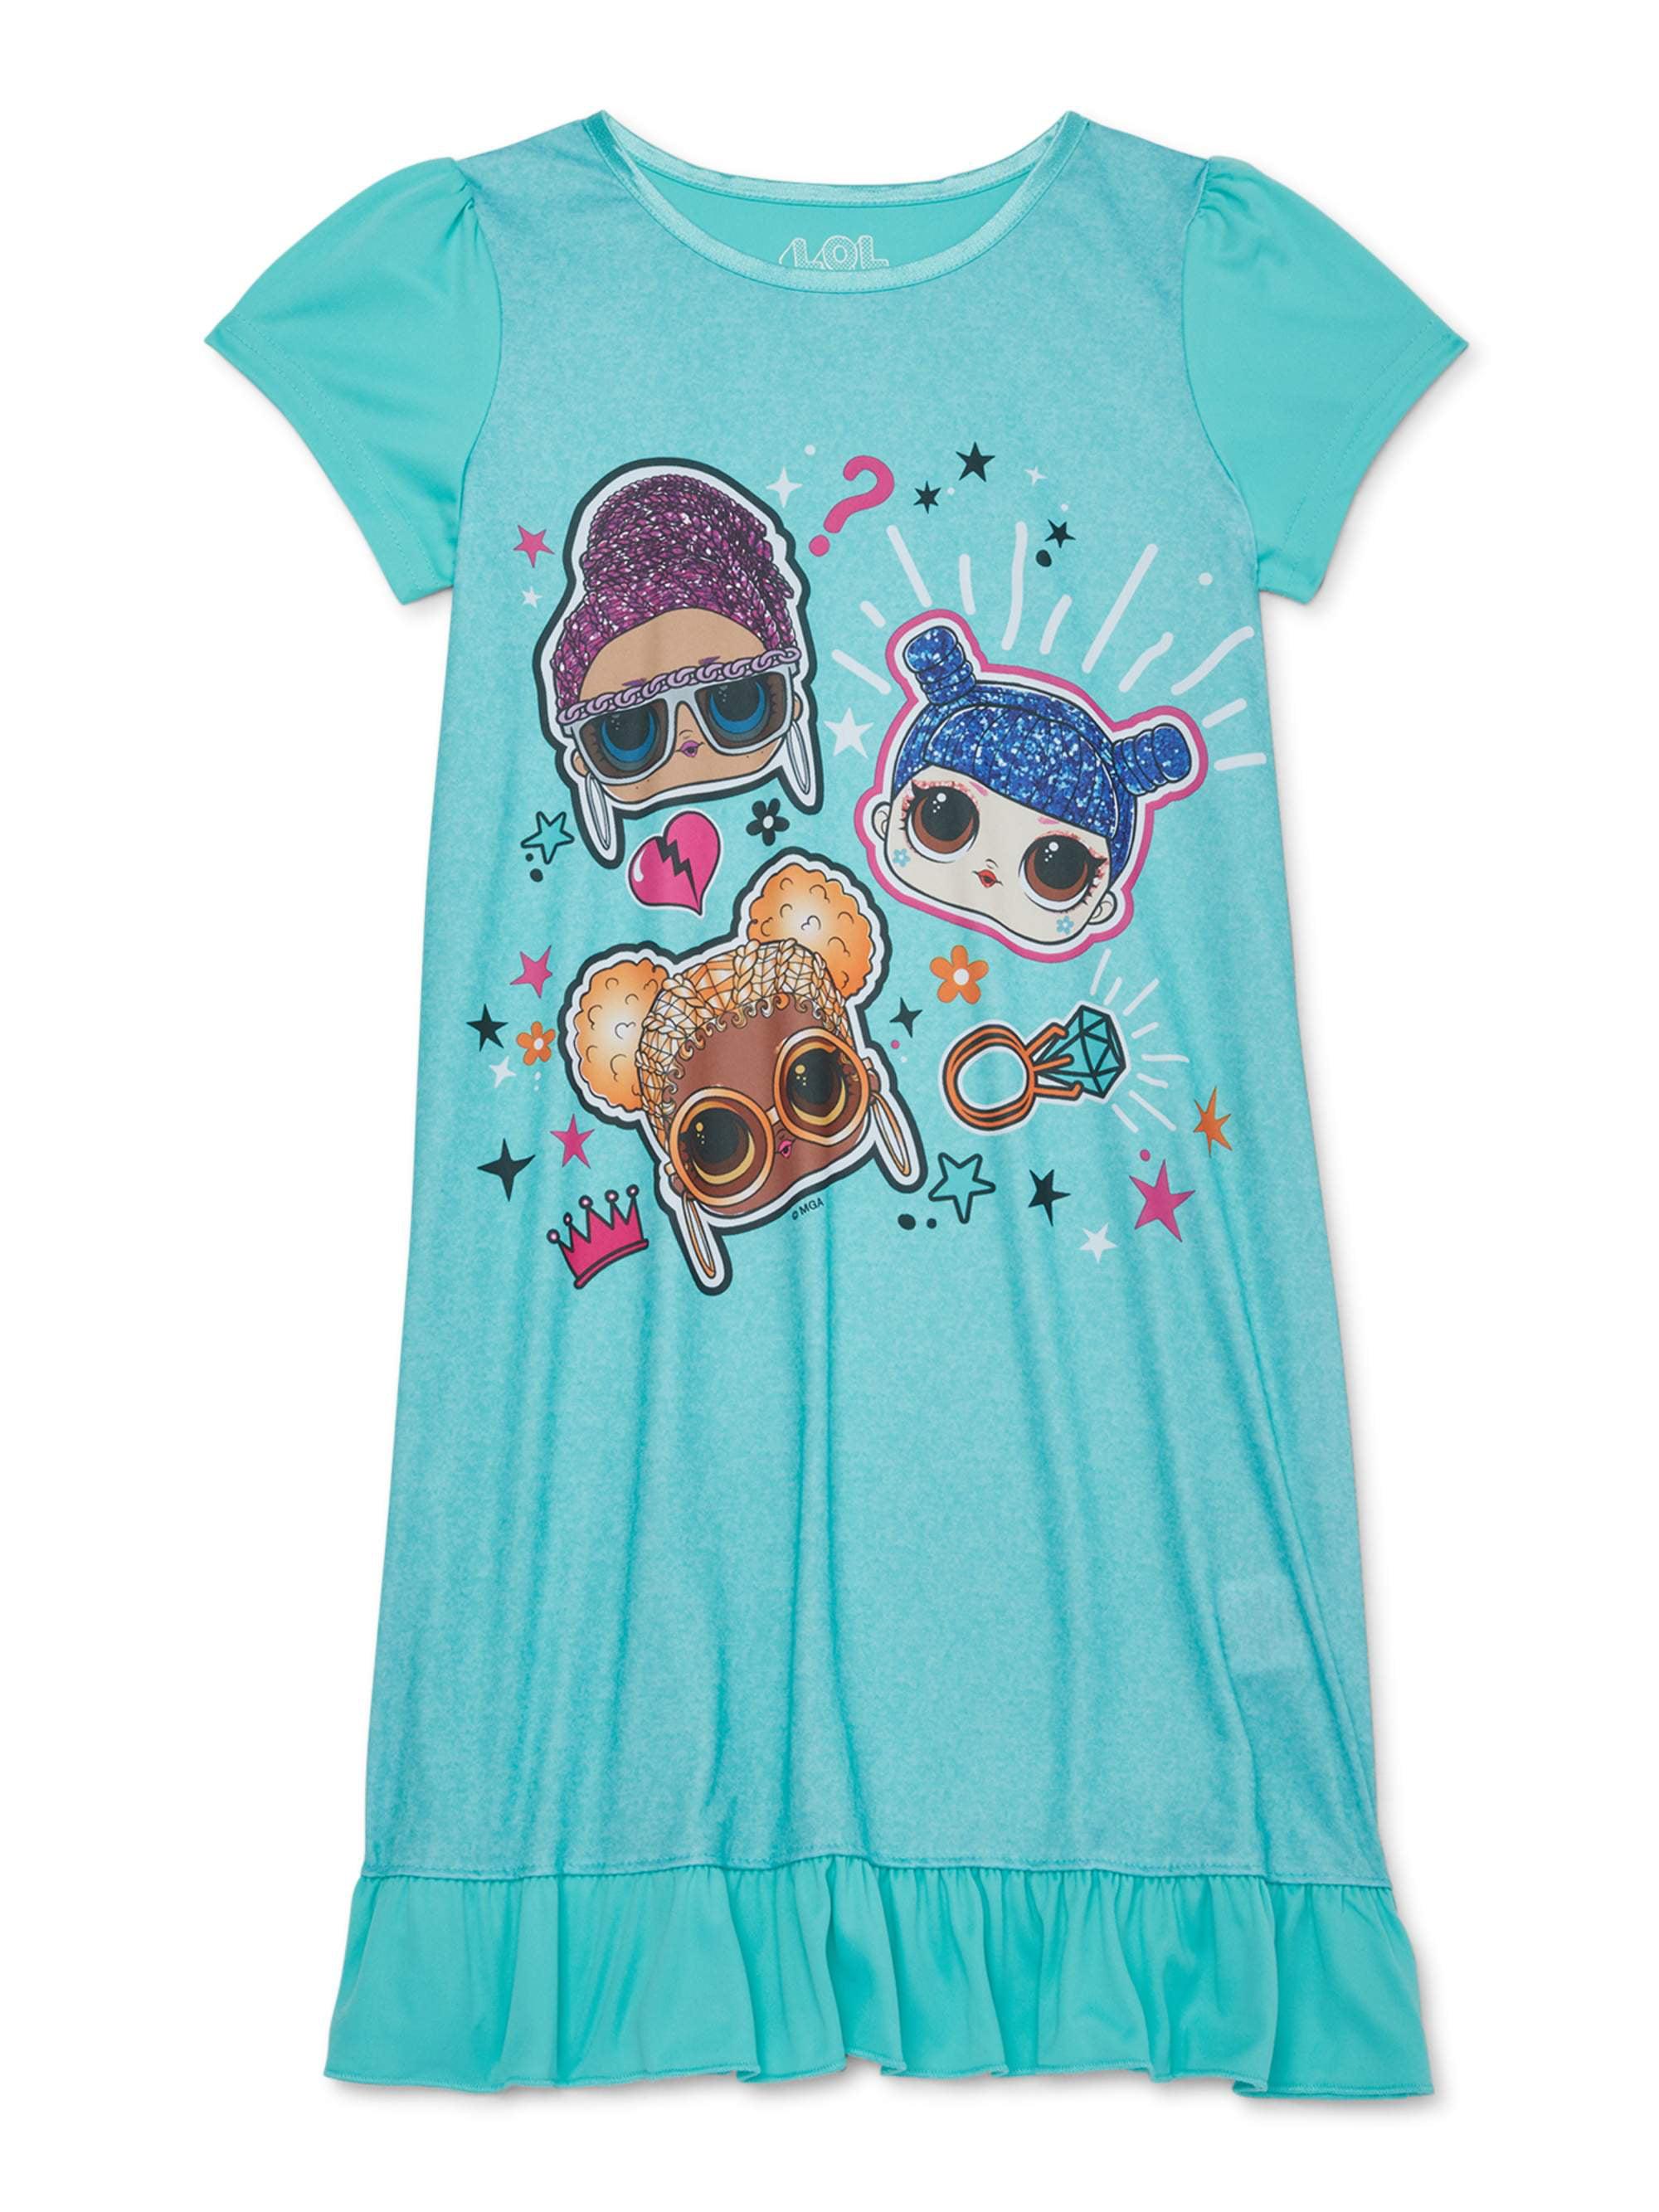 LOL SURPRISE Doll Girls Kids Short Sleeve Pyjama Set with Pockets